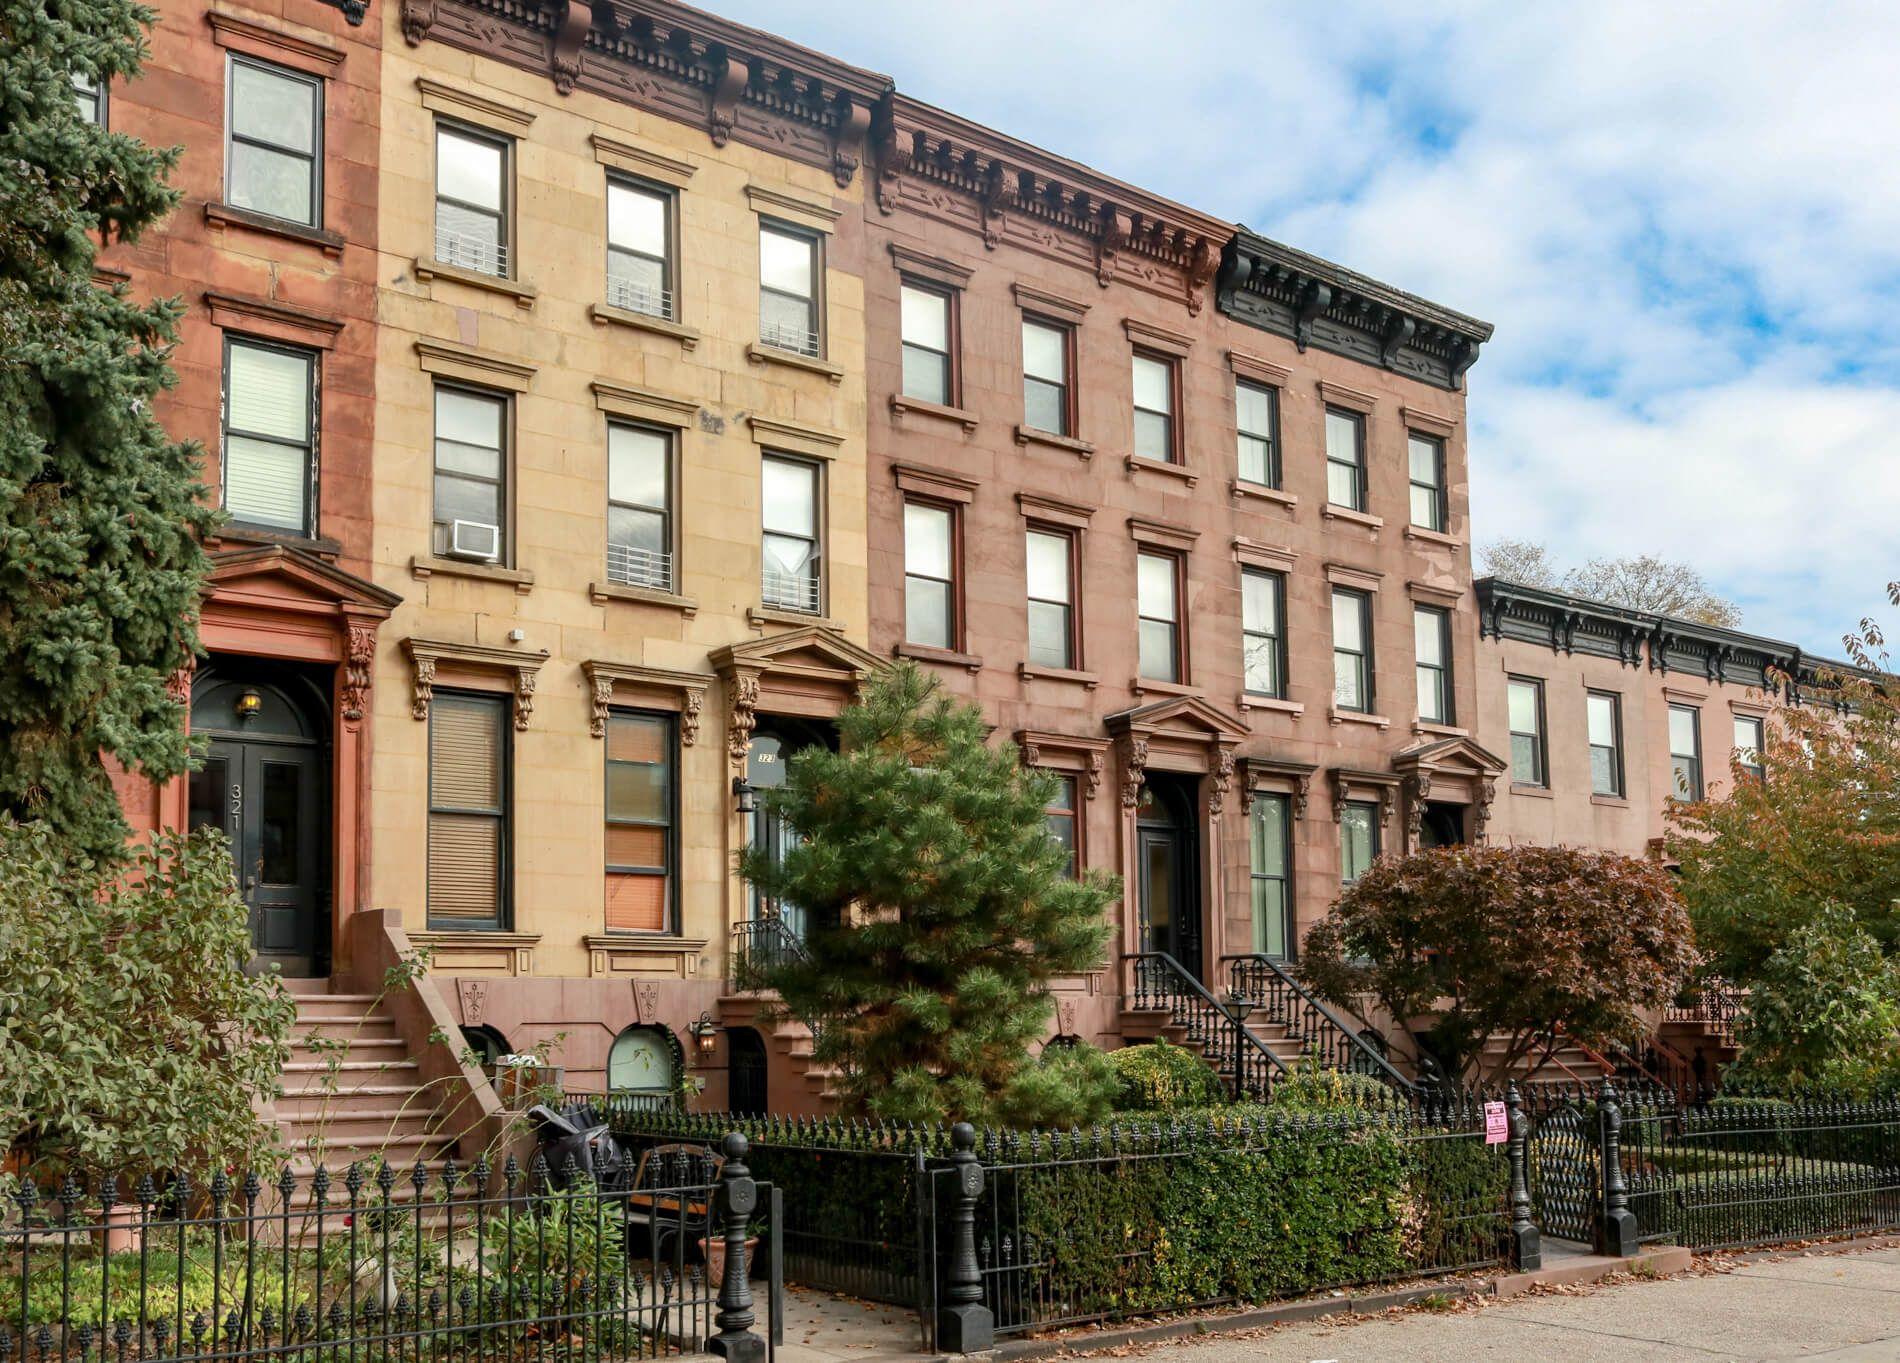 New York City Boroughs ~ Brooklyn | Brownstones | NYC